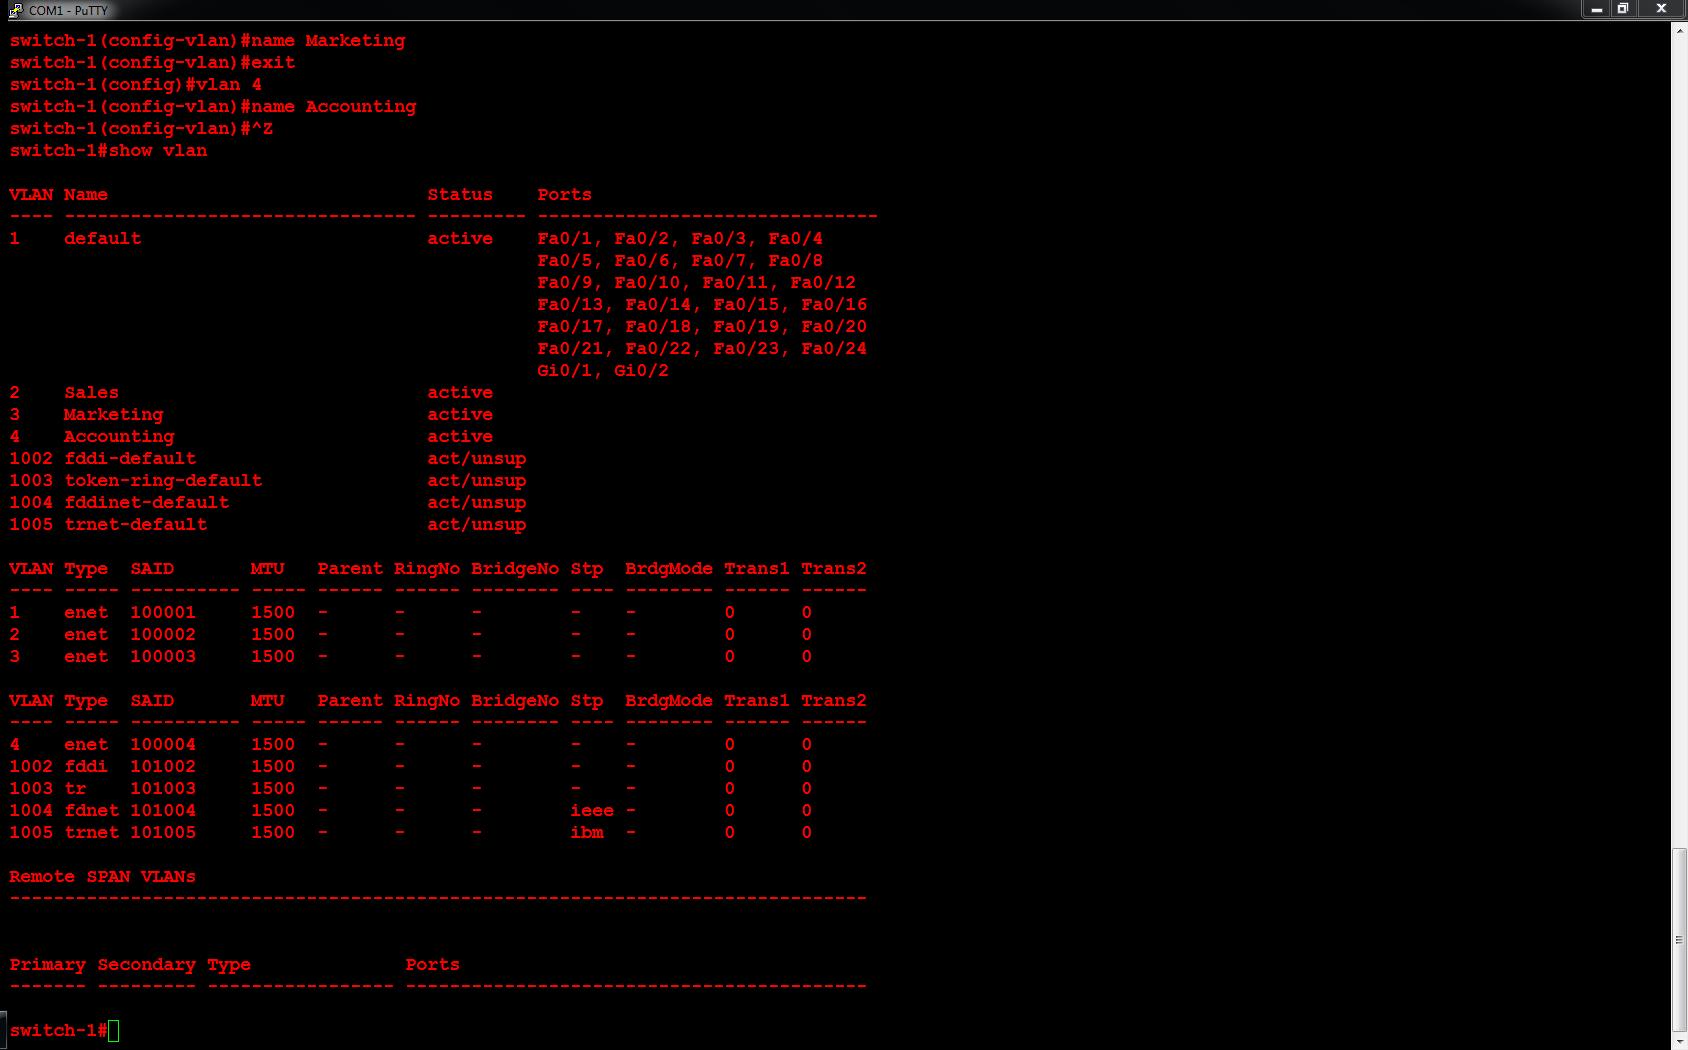 Cisco – Configure Cisco Catalyst 3560 VLANs - 02